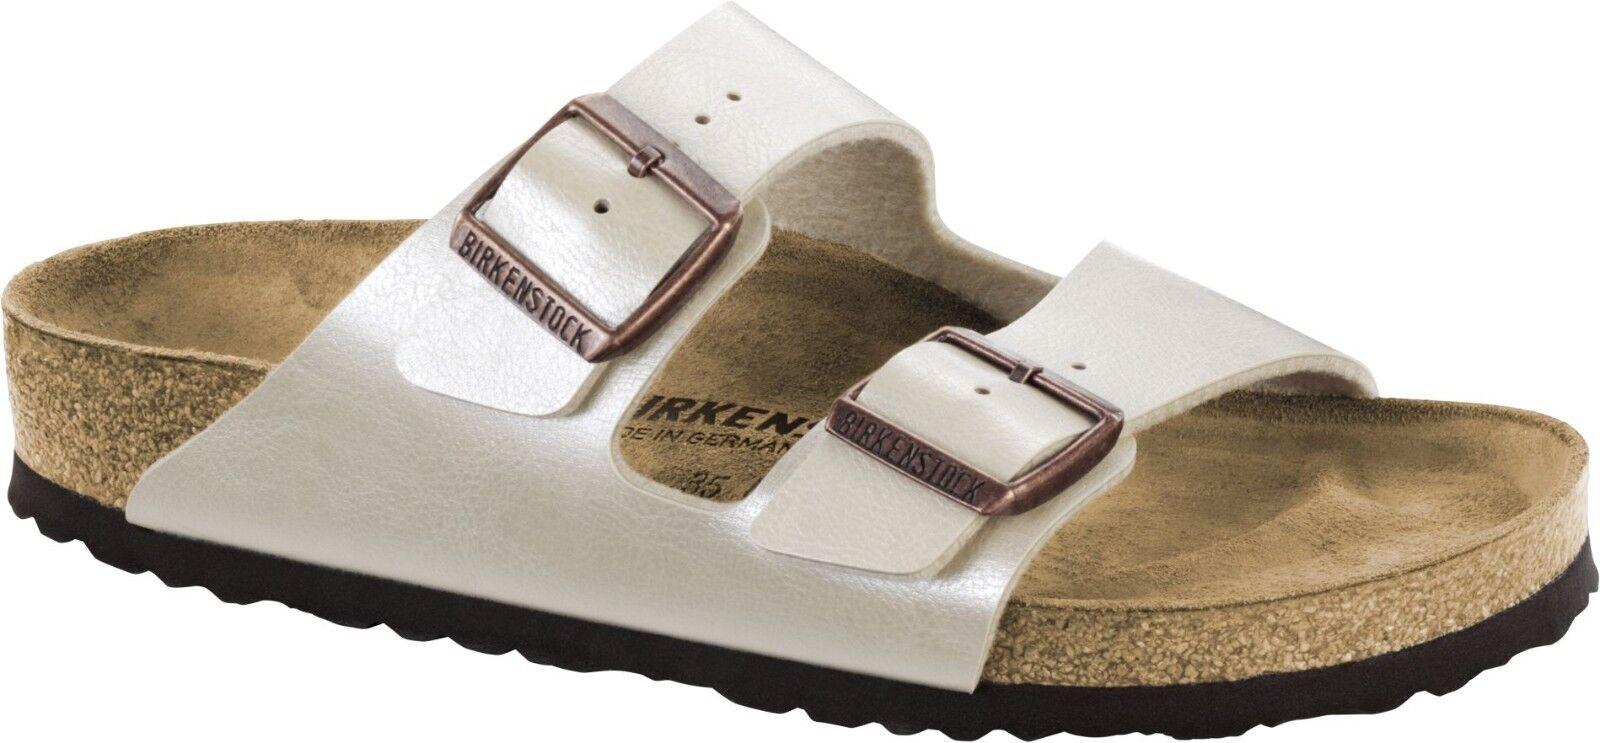 Birkenstock Arizona Graceful 36-42 Pearl White Sandale Größe 36-42 Graceful Fußbett schmal ccaaff